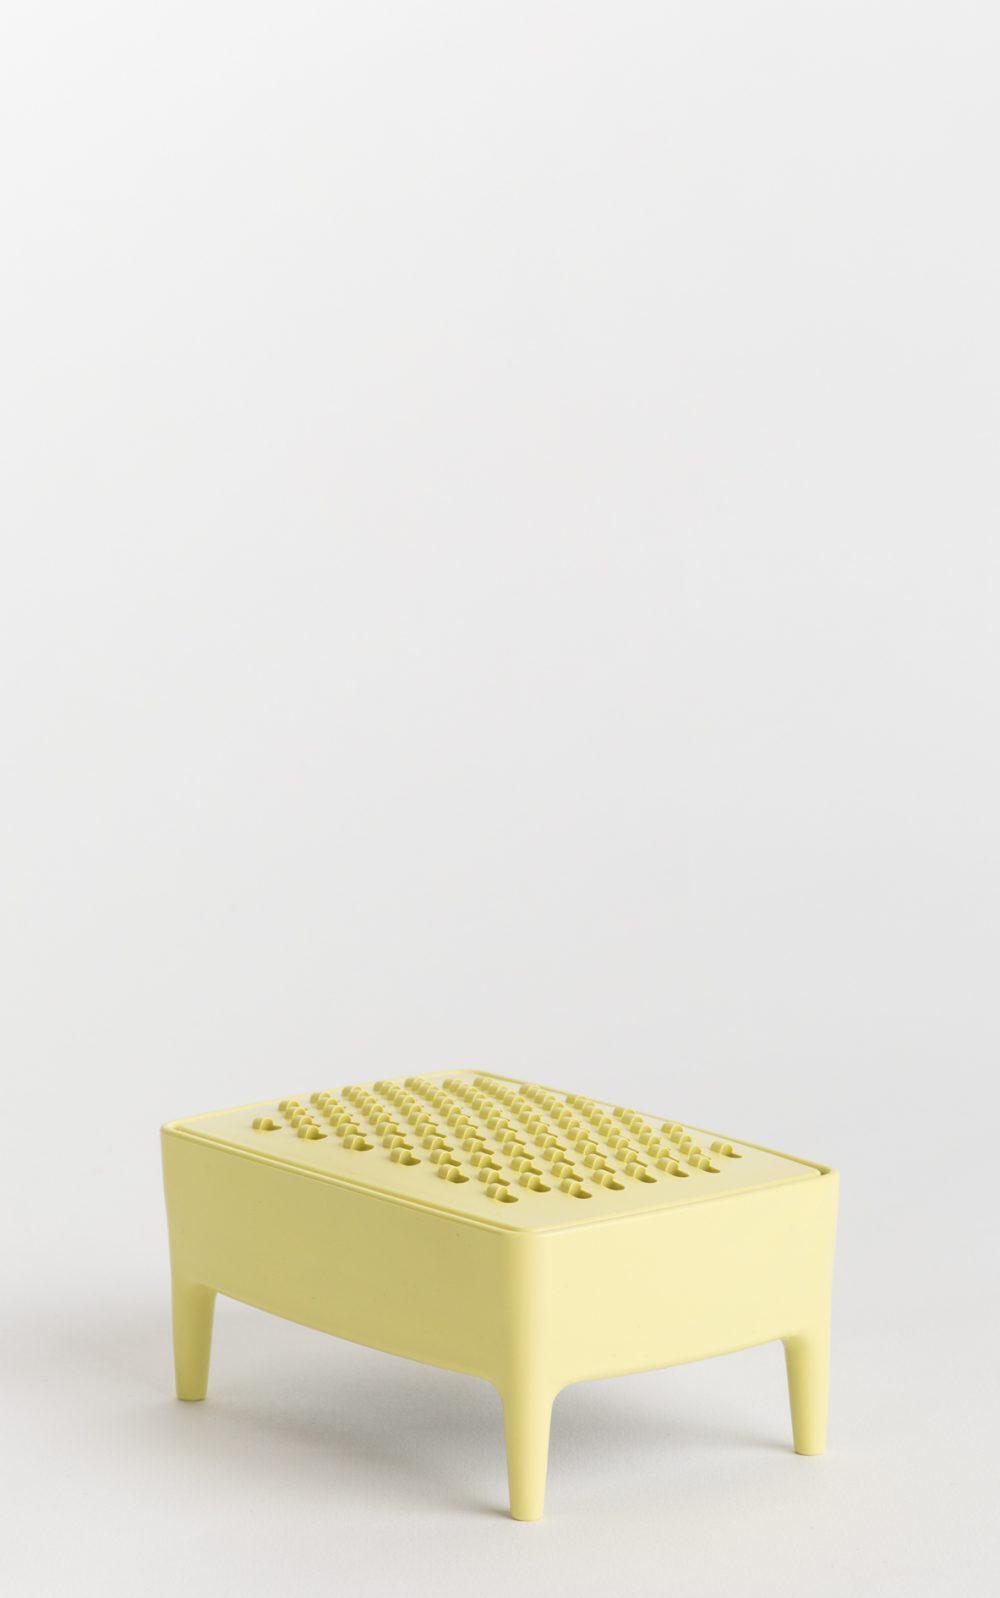 foekjefleur_bubblebuddy_mellowyellow_dispenser_soap_recycled_plastic_grater